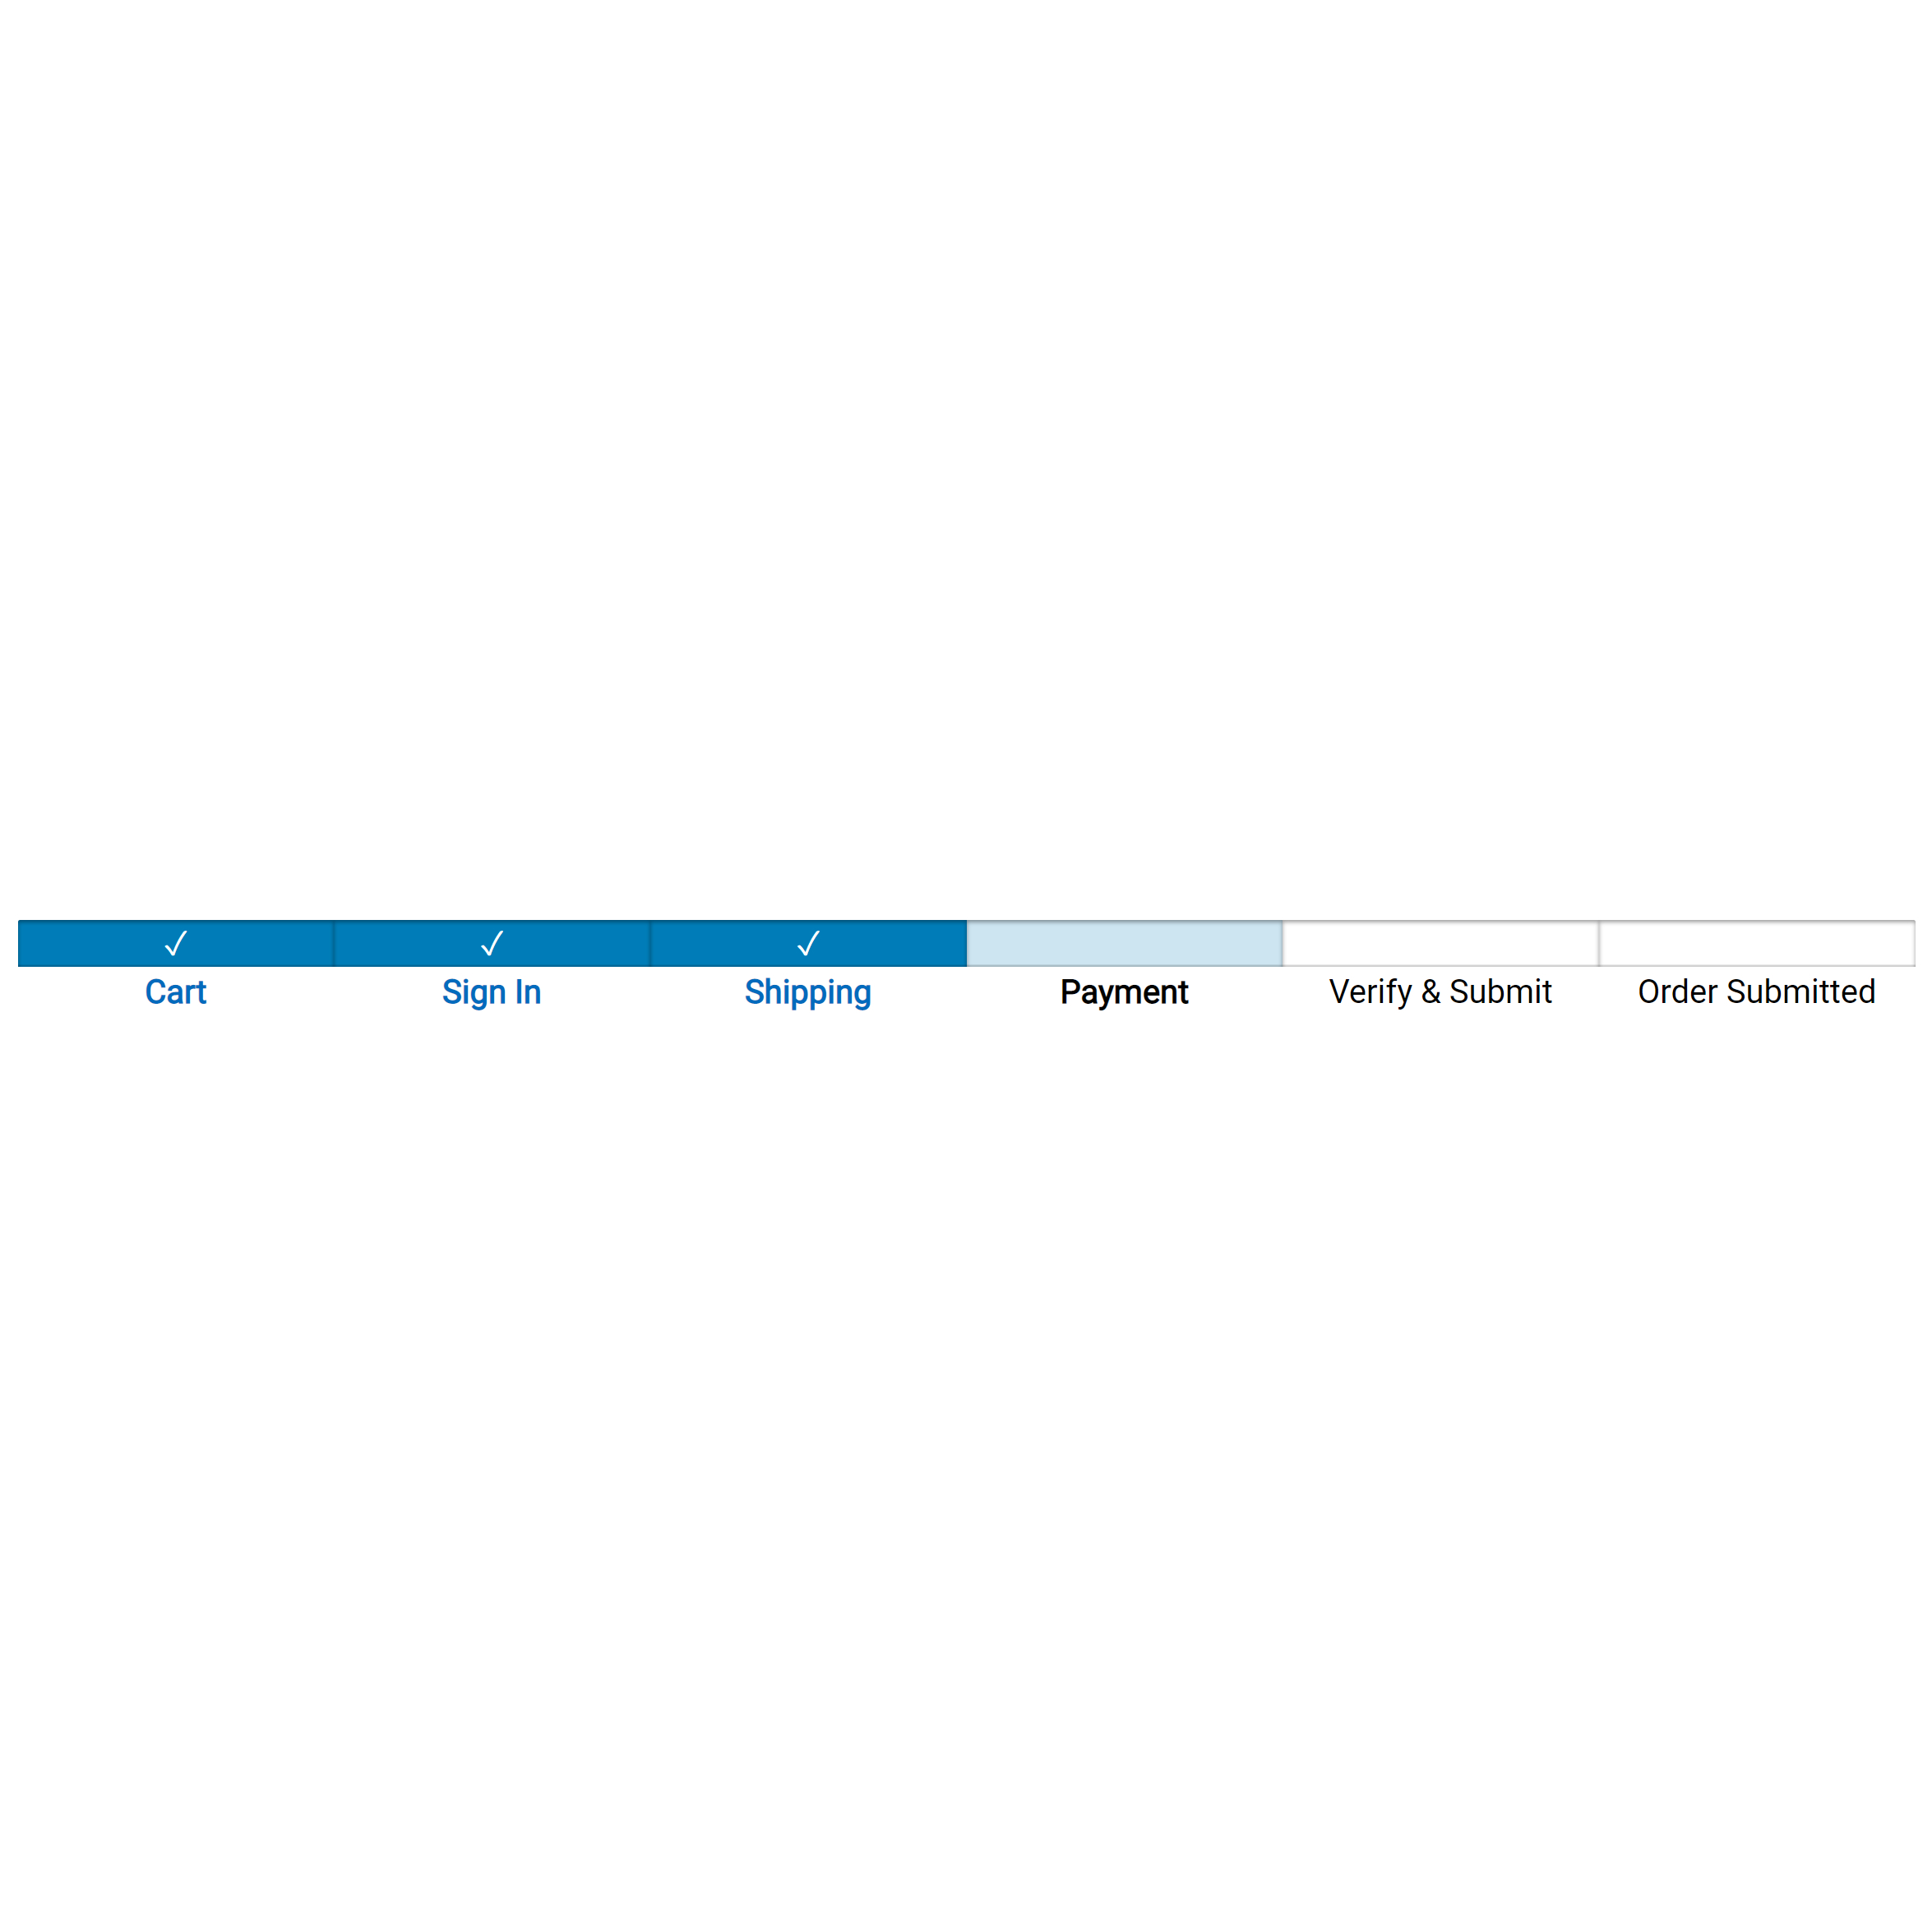 Standard User Progress Tracker